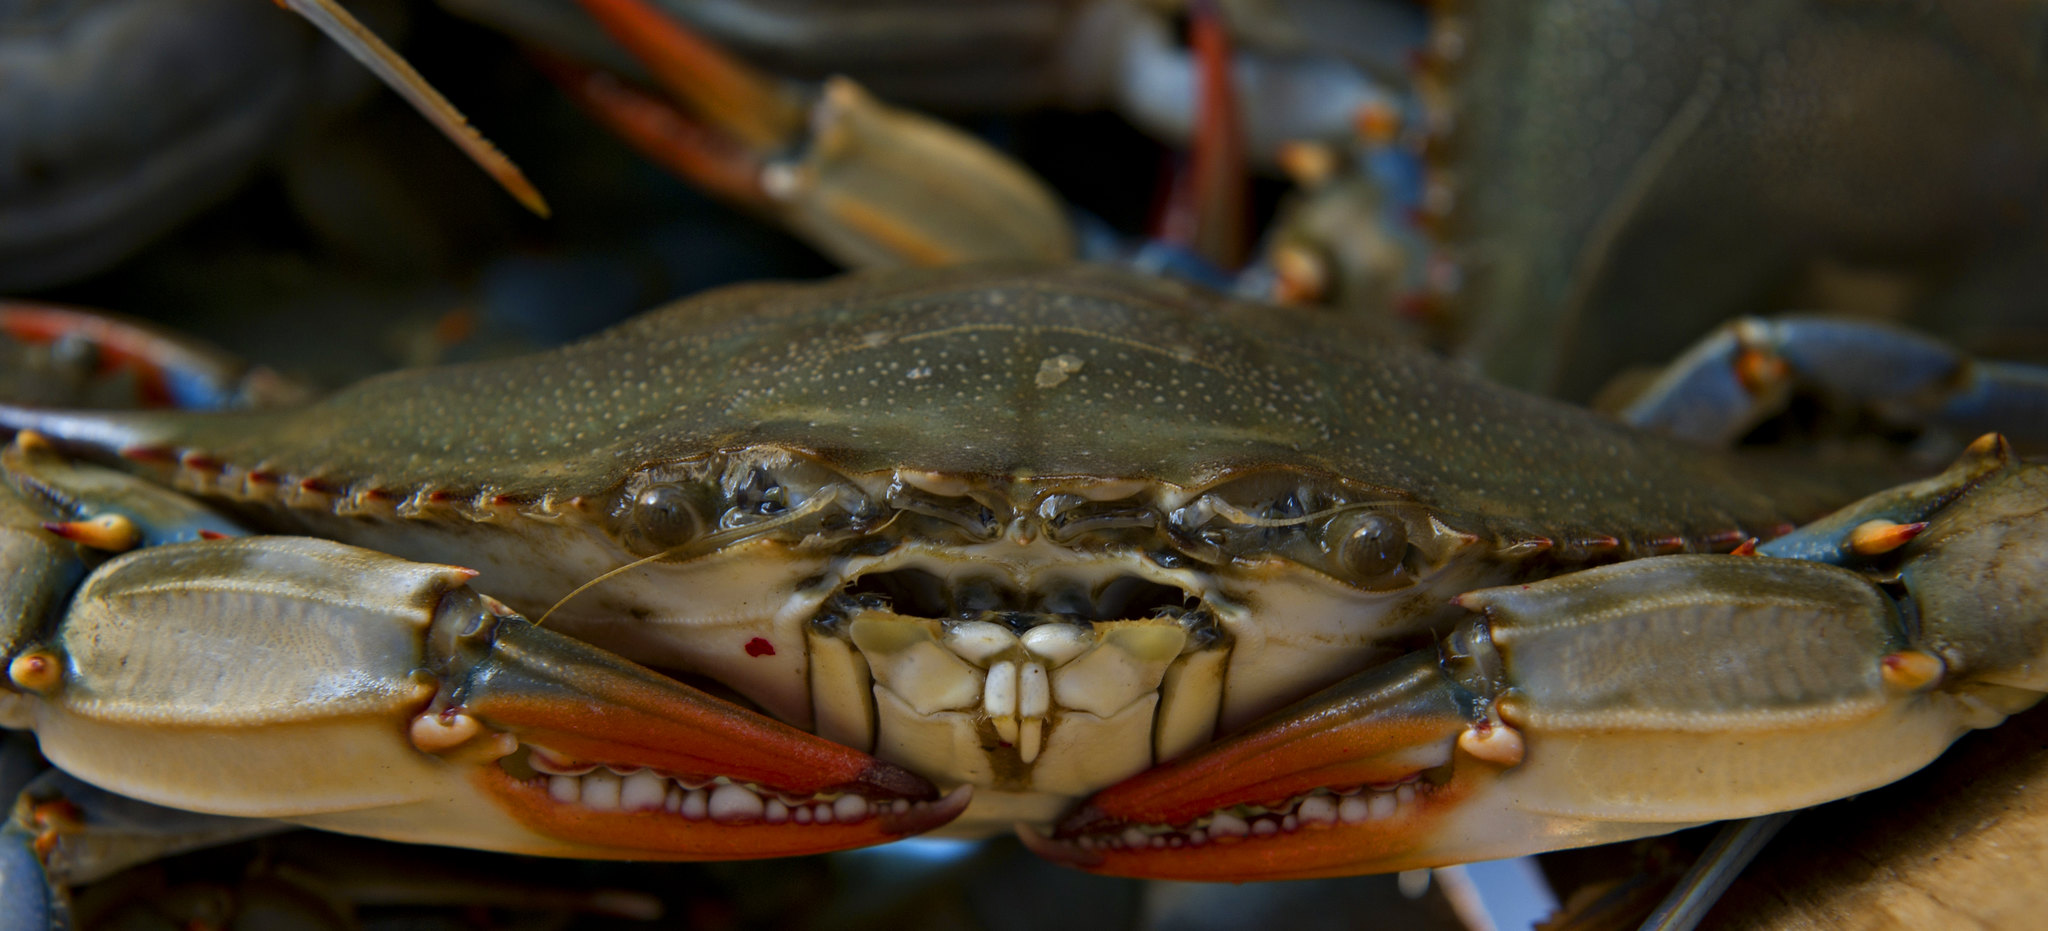 Close up of Maryland blue crab